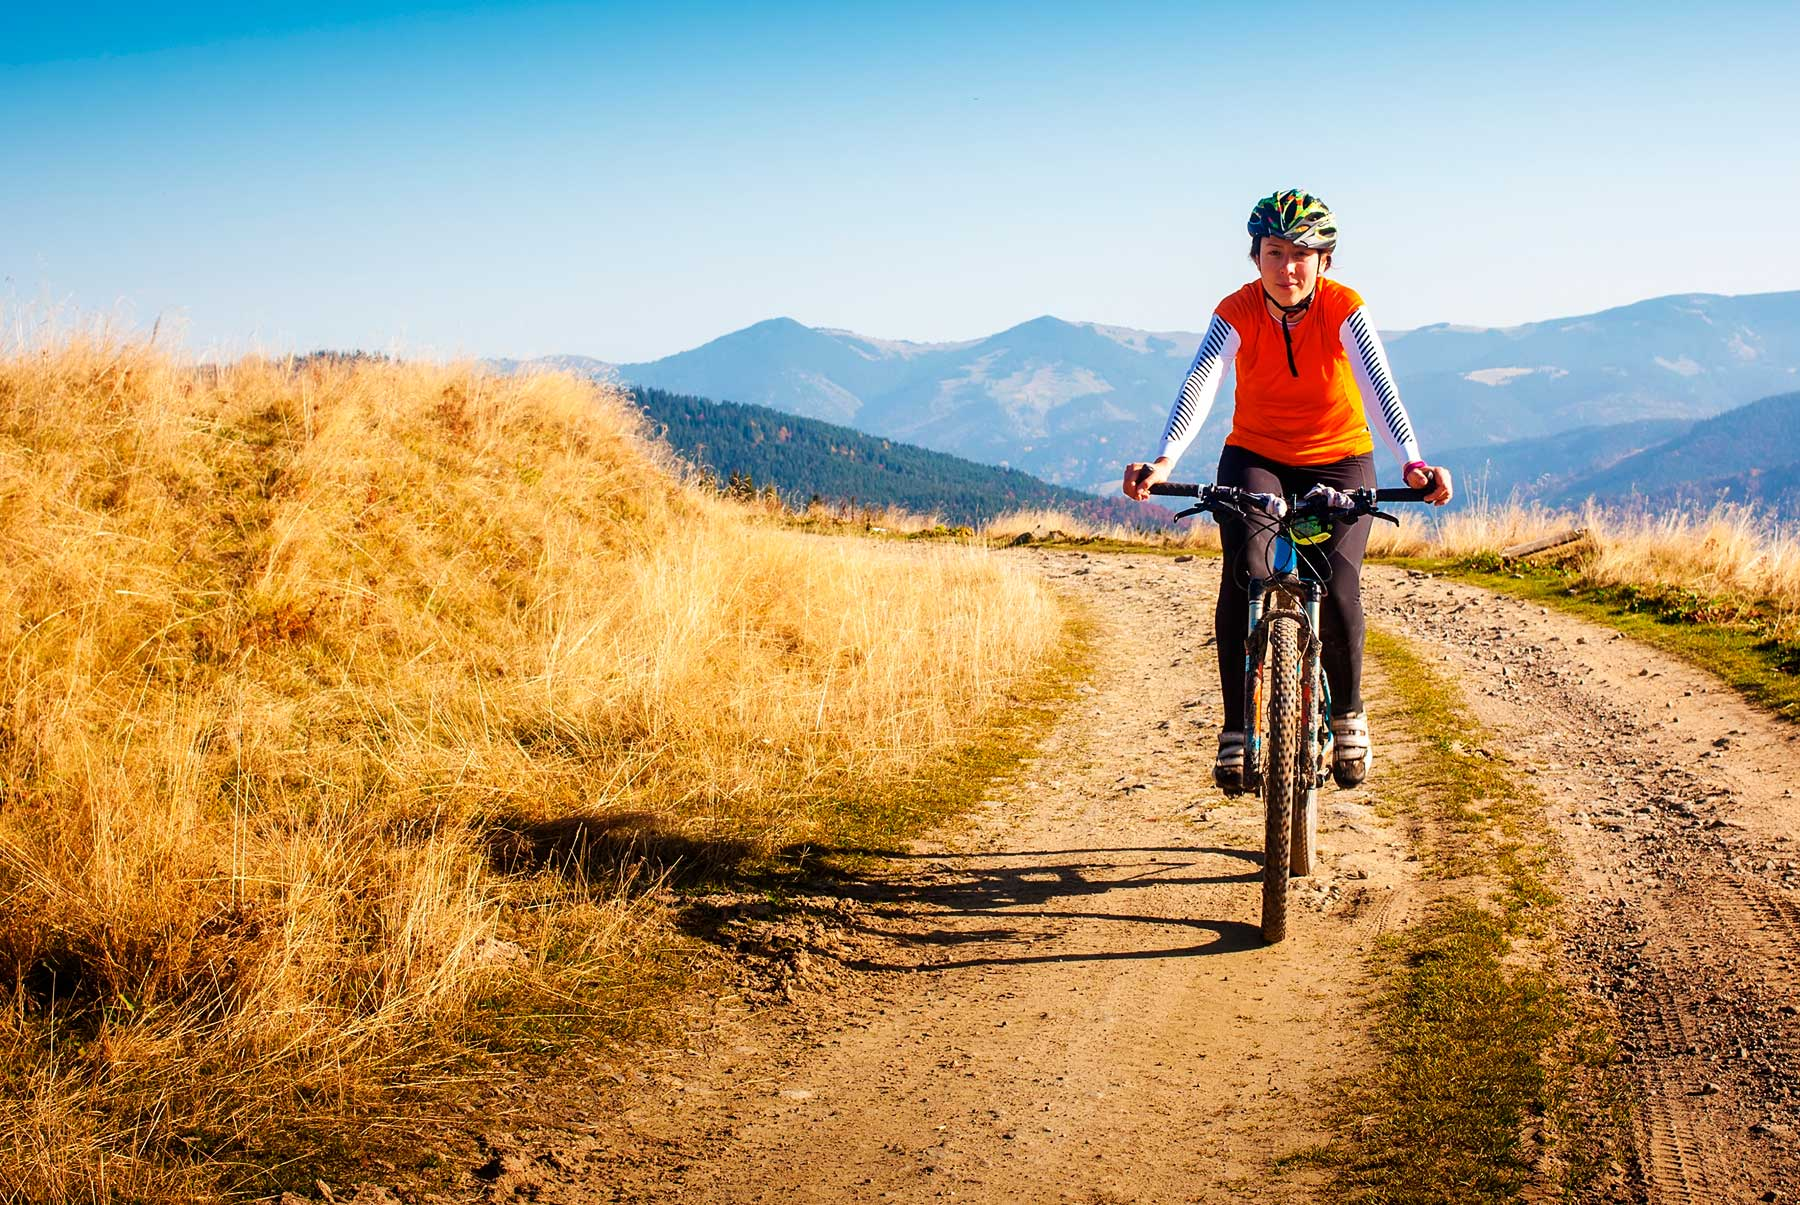 Springwater Hill - Columbia Lake activities - Mountain Biking